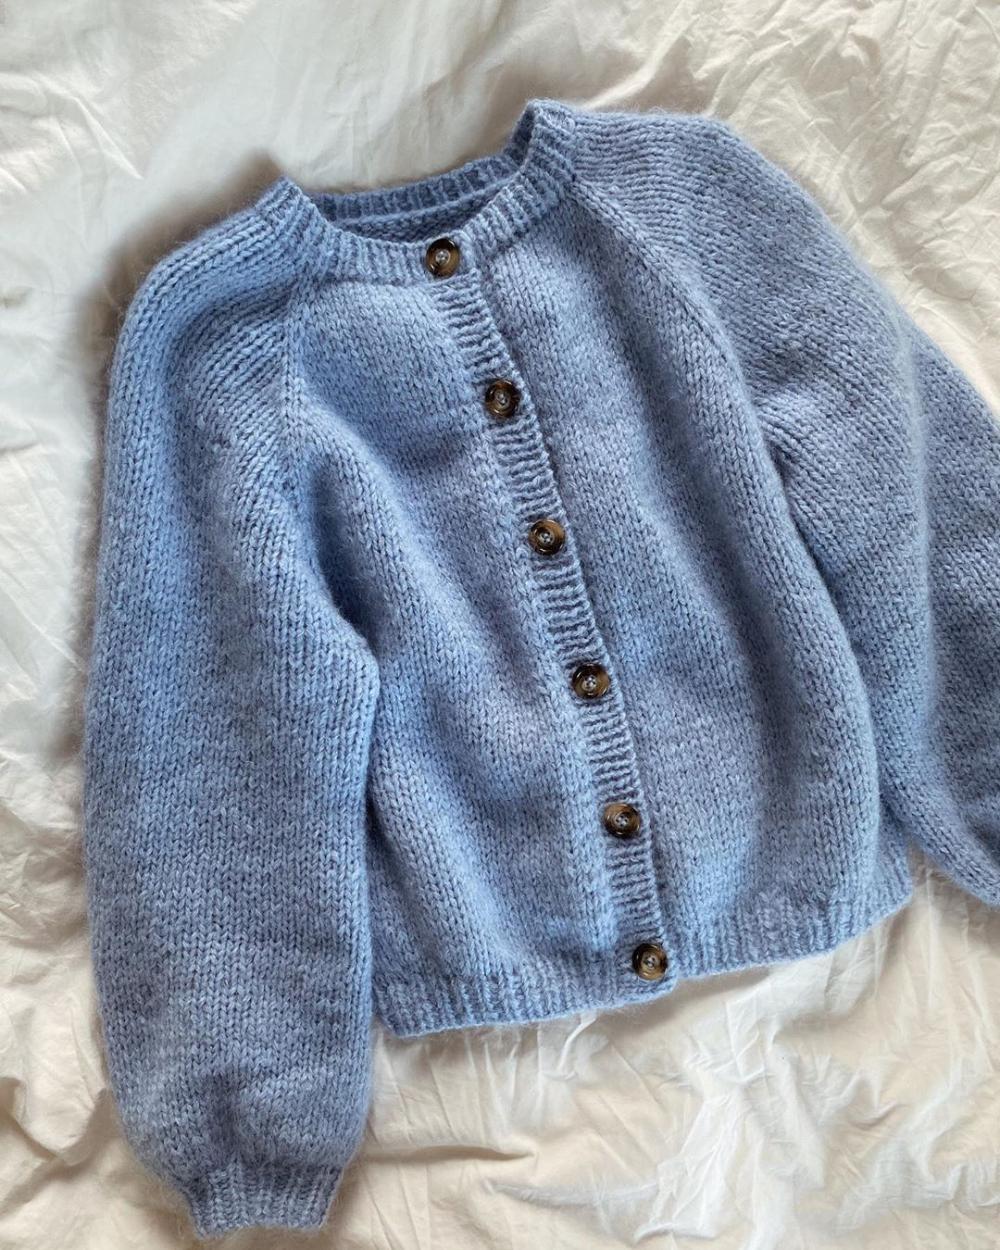 My Favourite Things Knitwear Myfavouritethings Knitwear Instagram Photos And Videos In 2021 Knitwear Cardigan Knitting Women